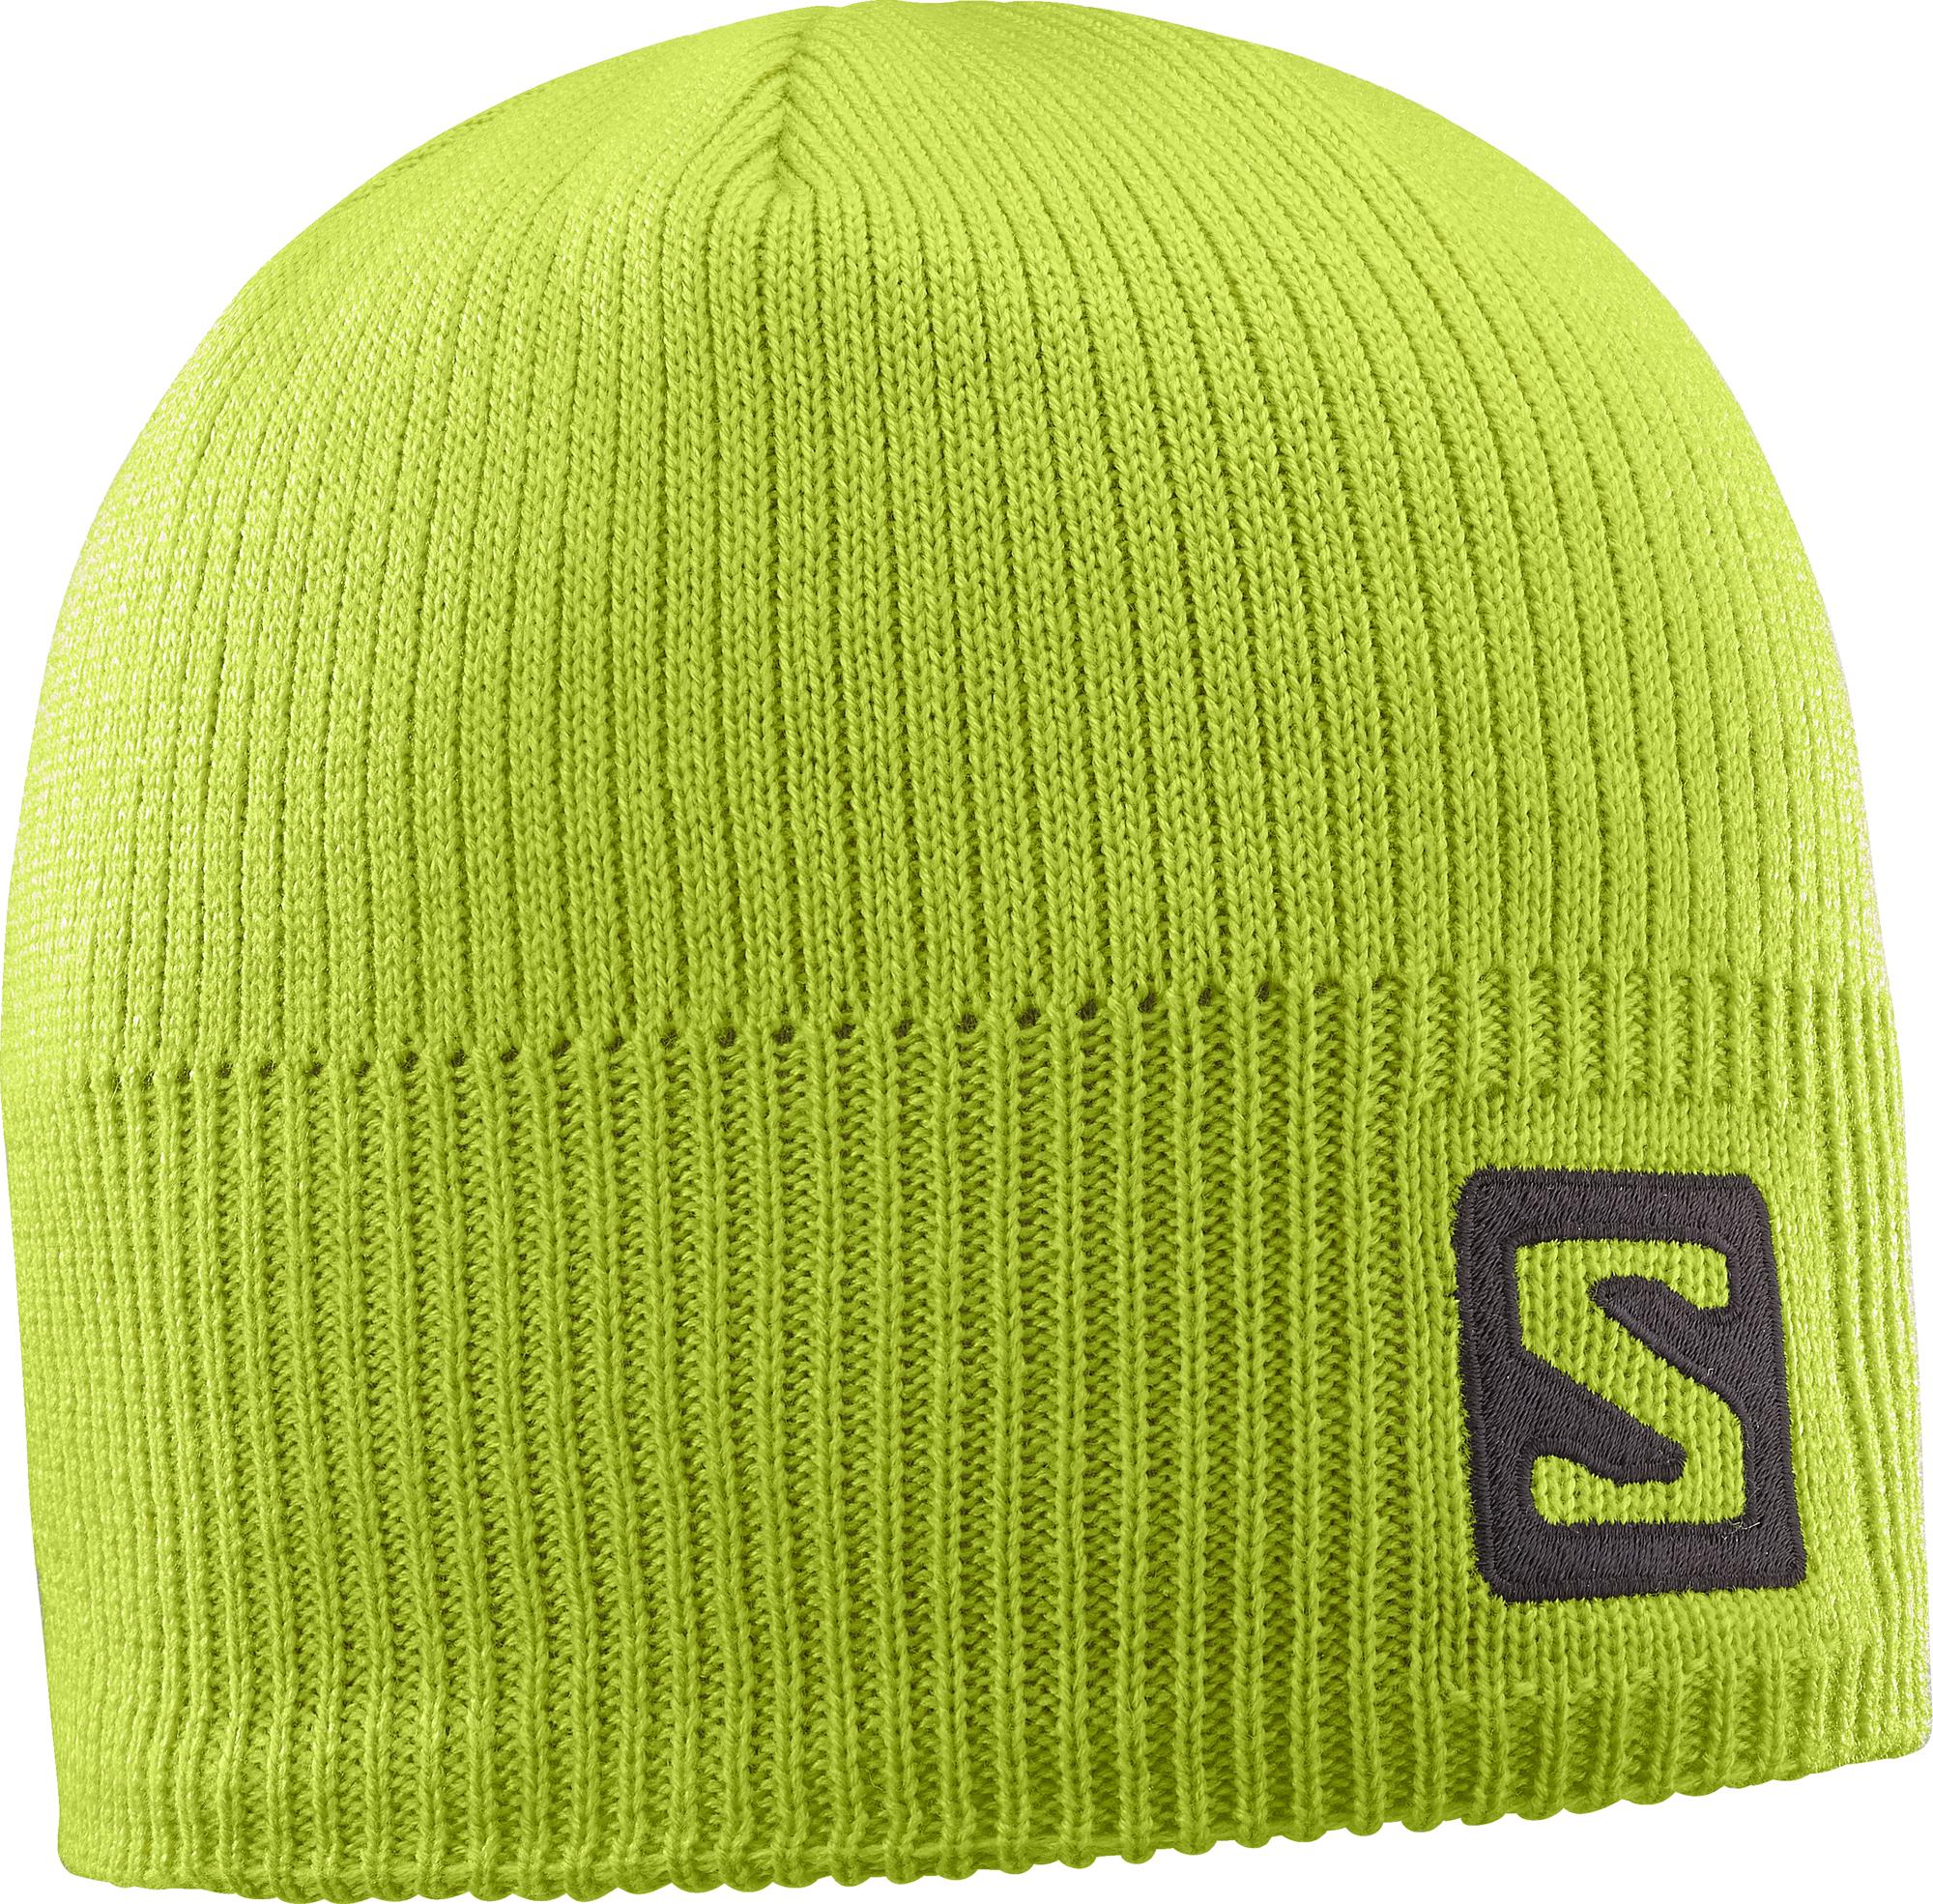 Salomon Logo Beanie Acid Lime 394963